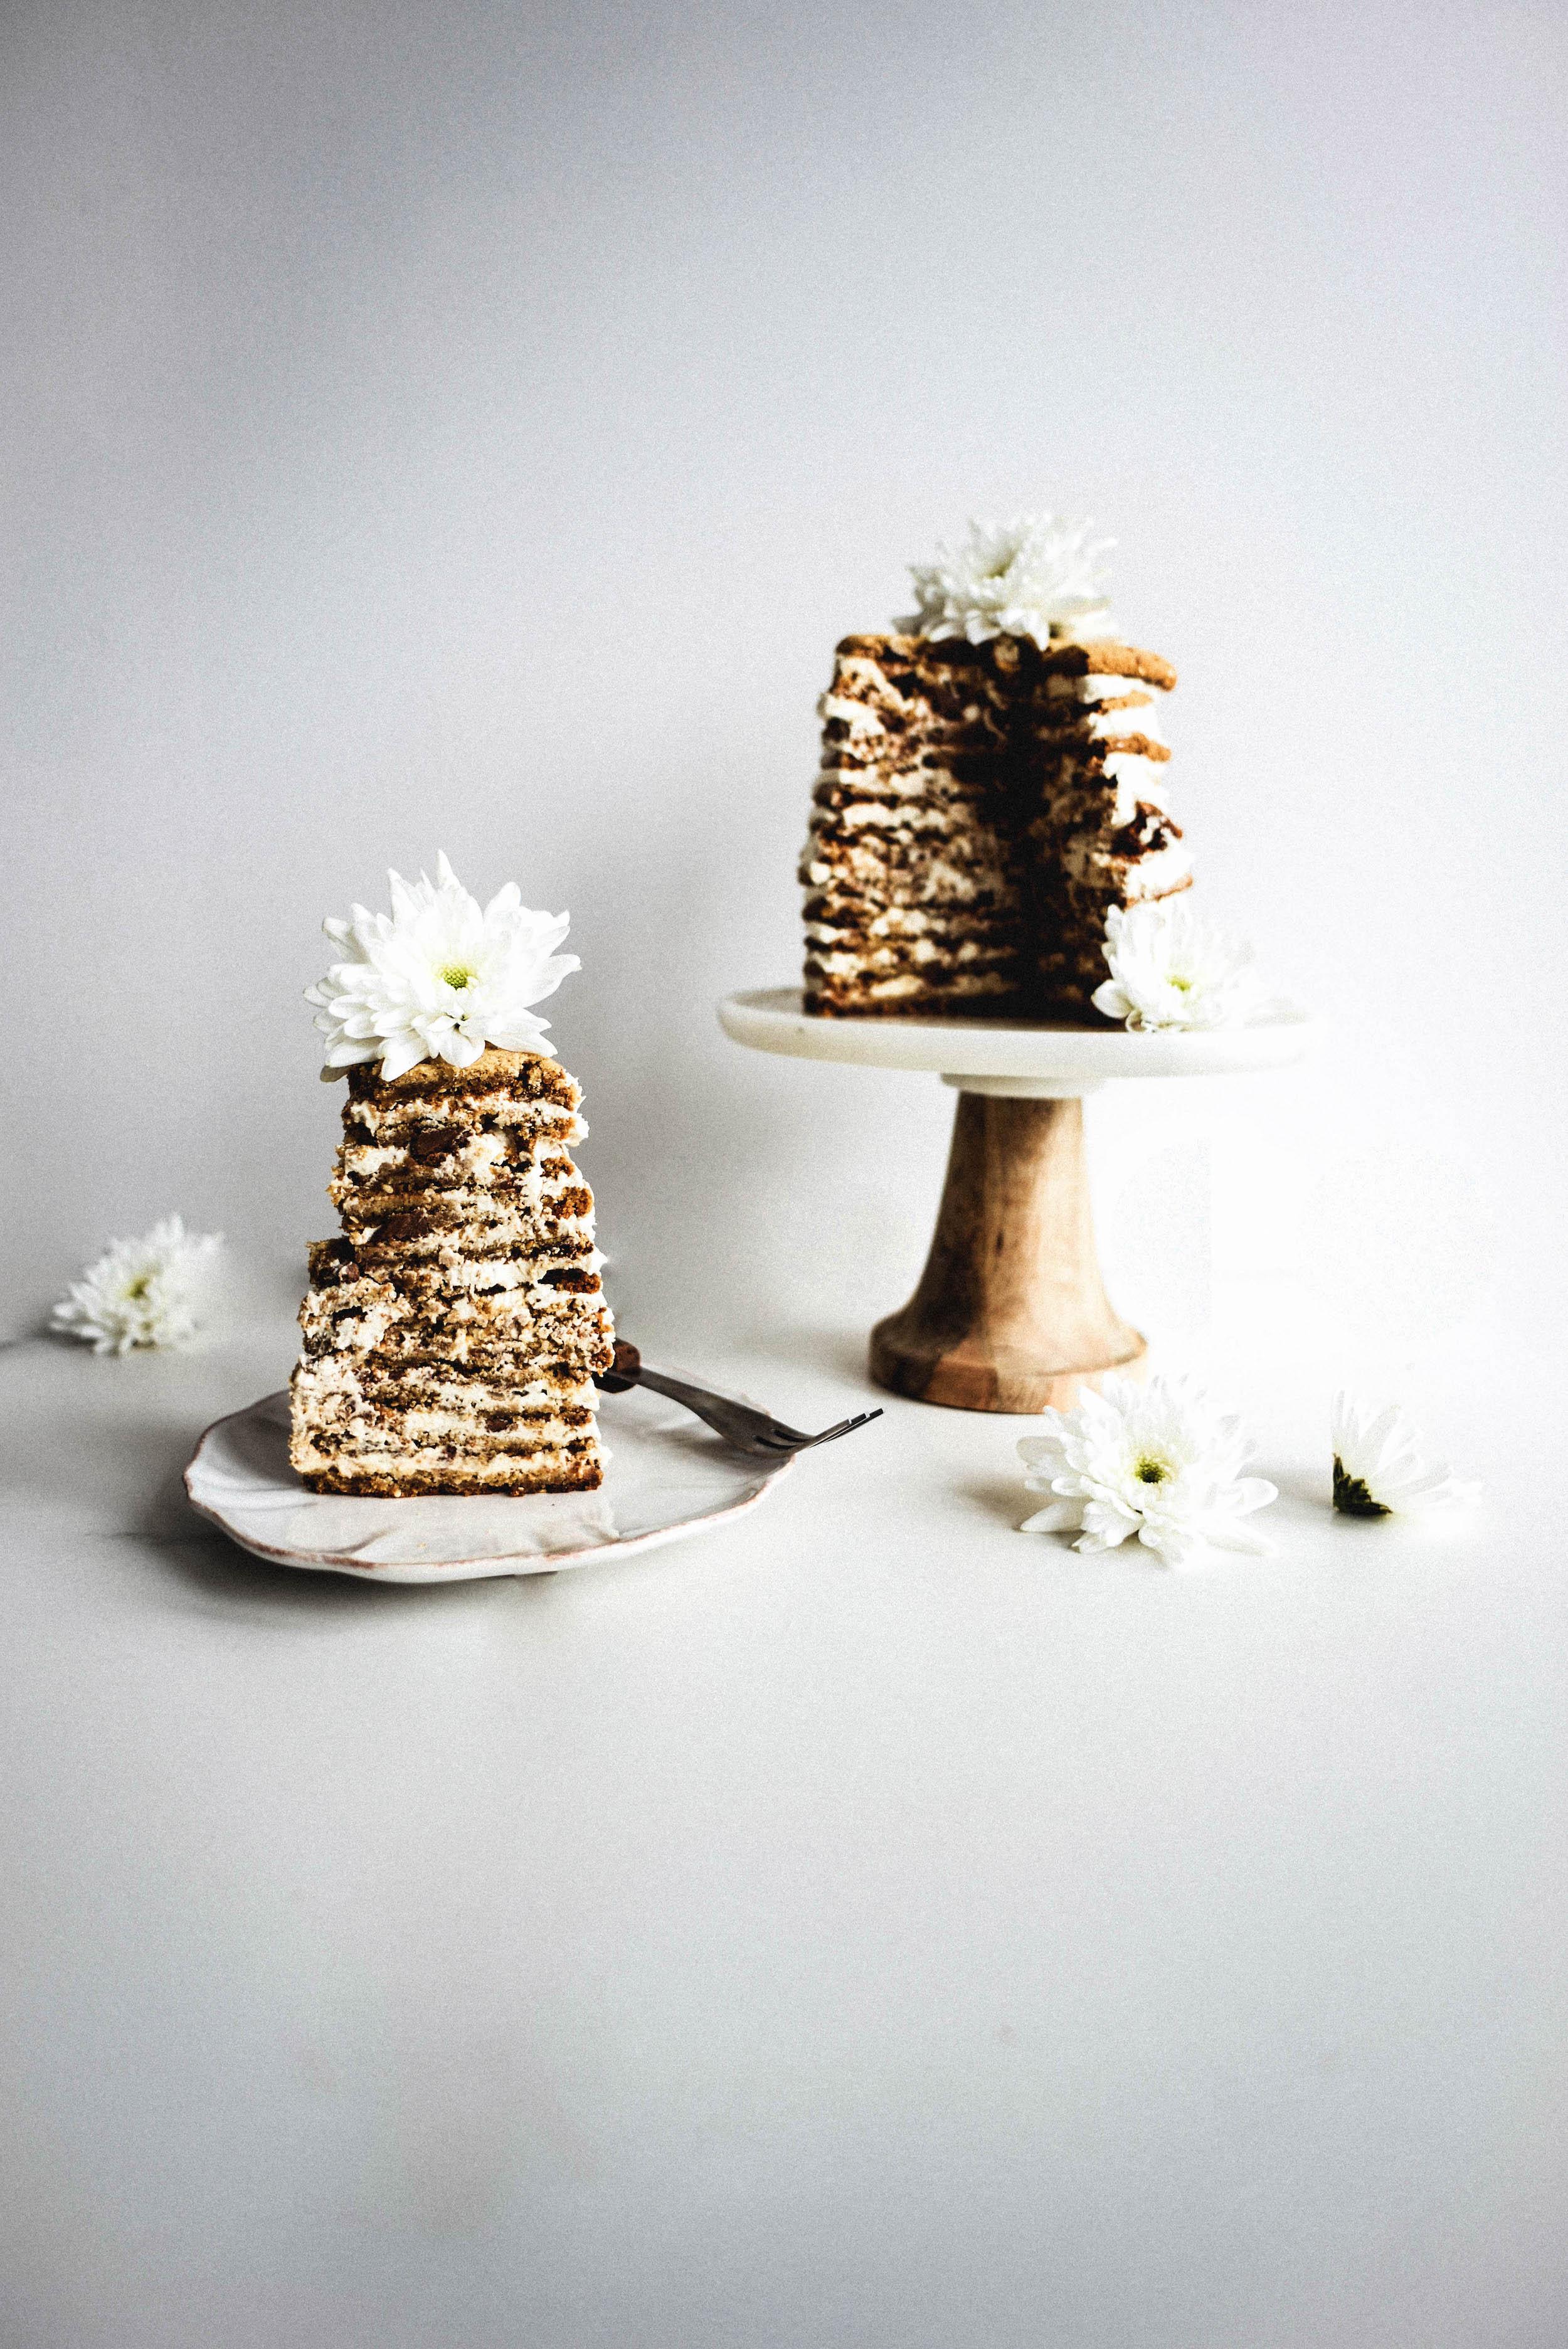 Toasted-Sesame-and-Chocolate-Cookie-Cake-with-Tahini-Halva-Buttercream-4.jpg